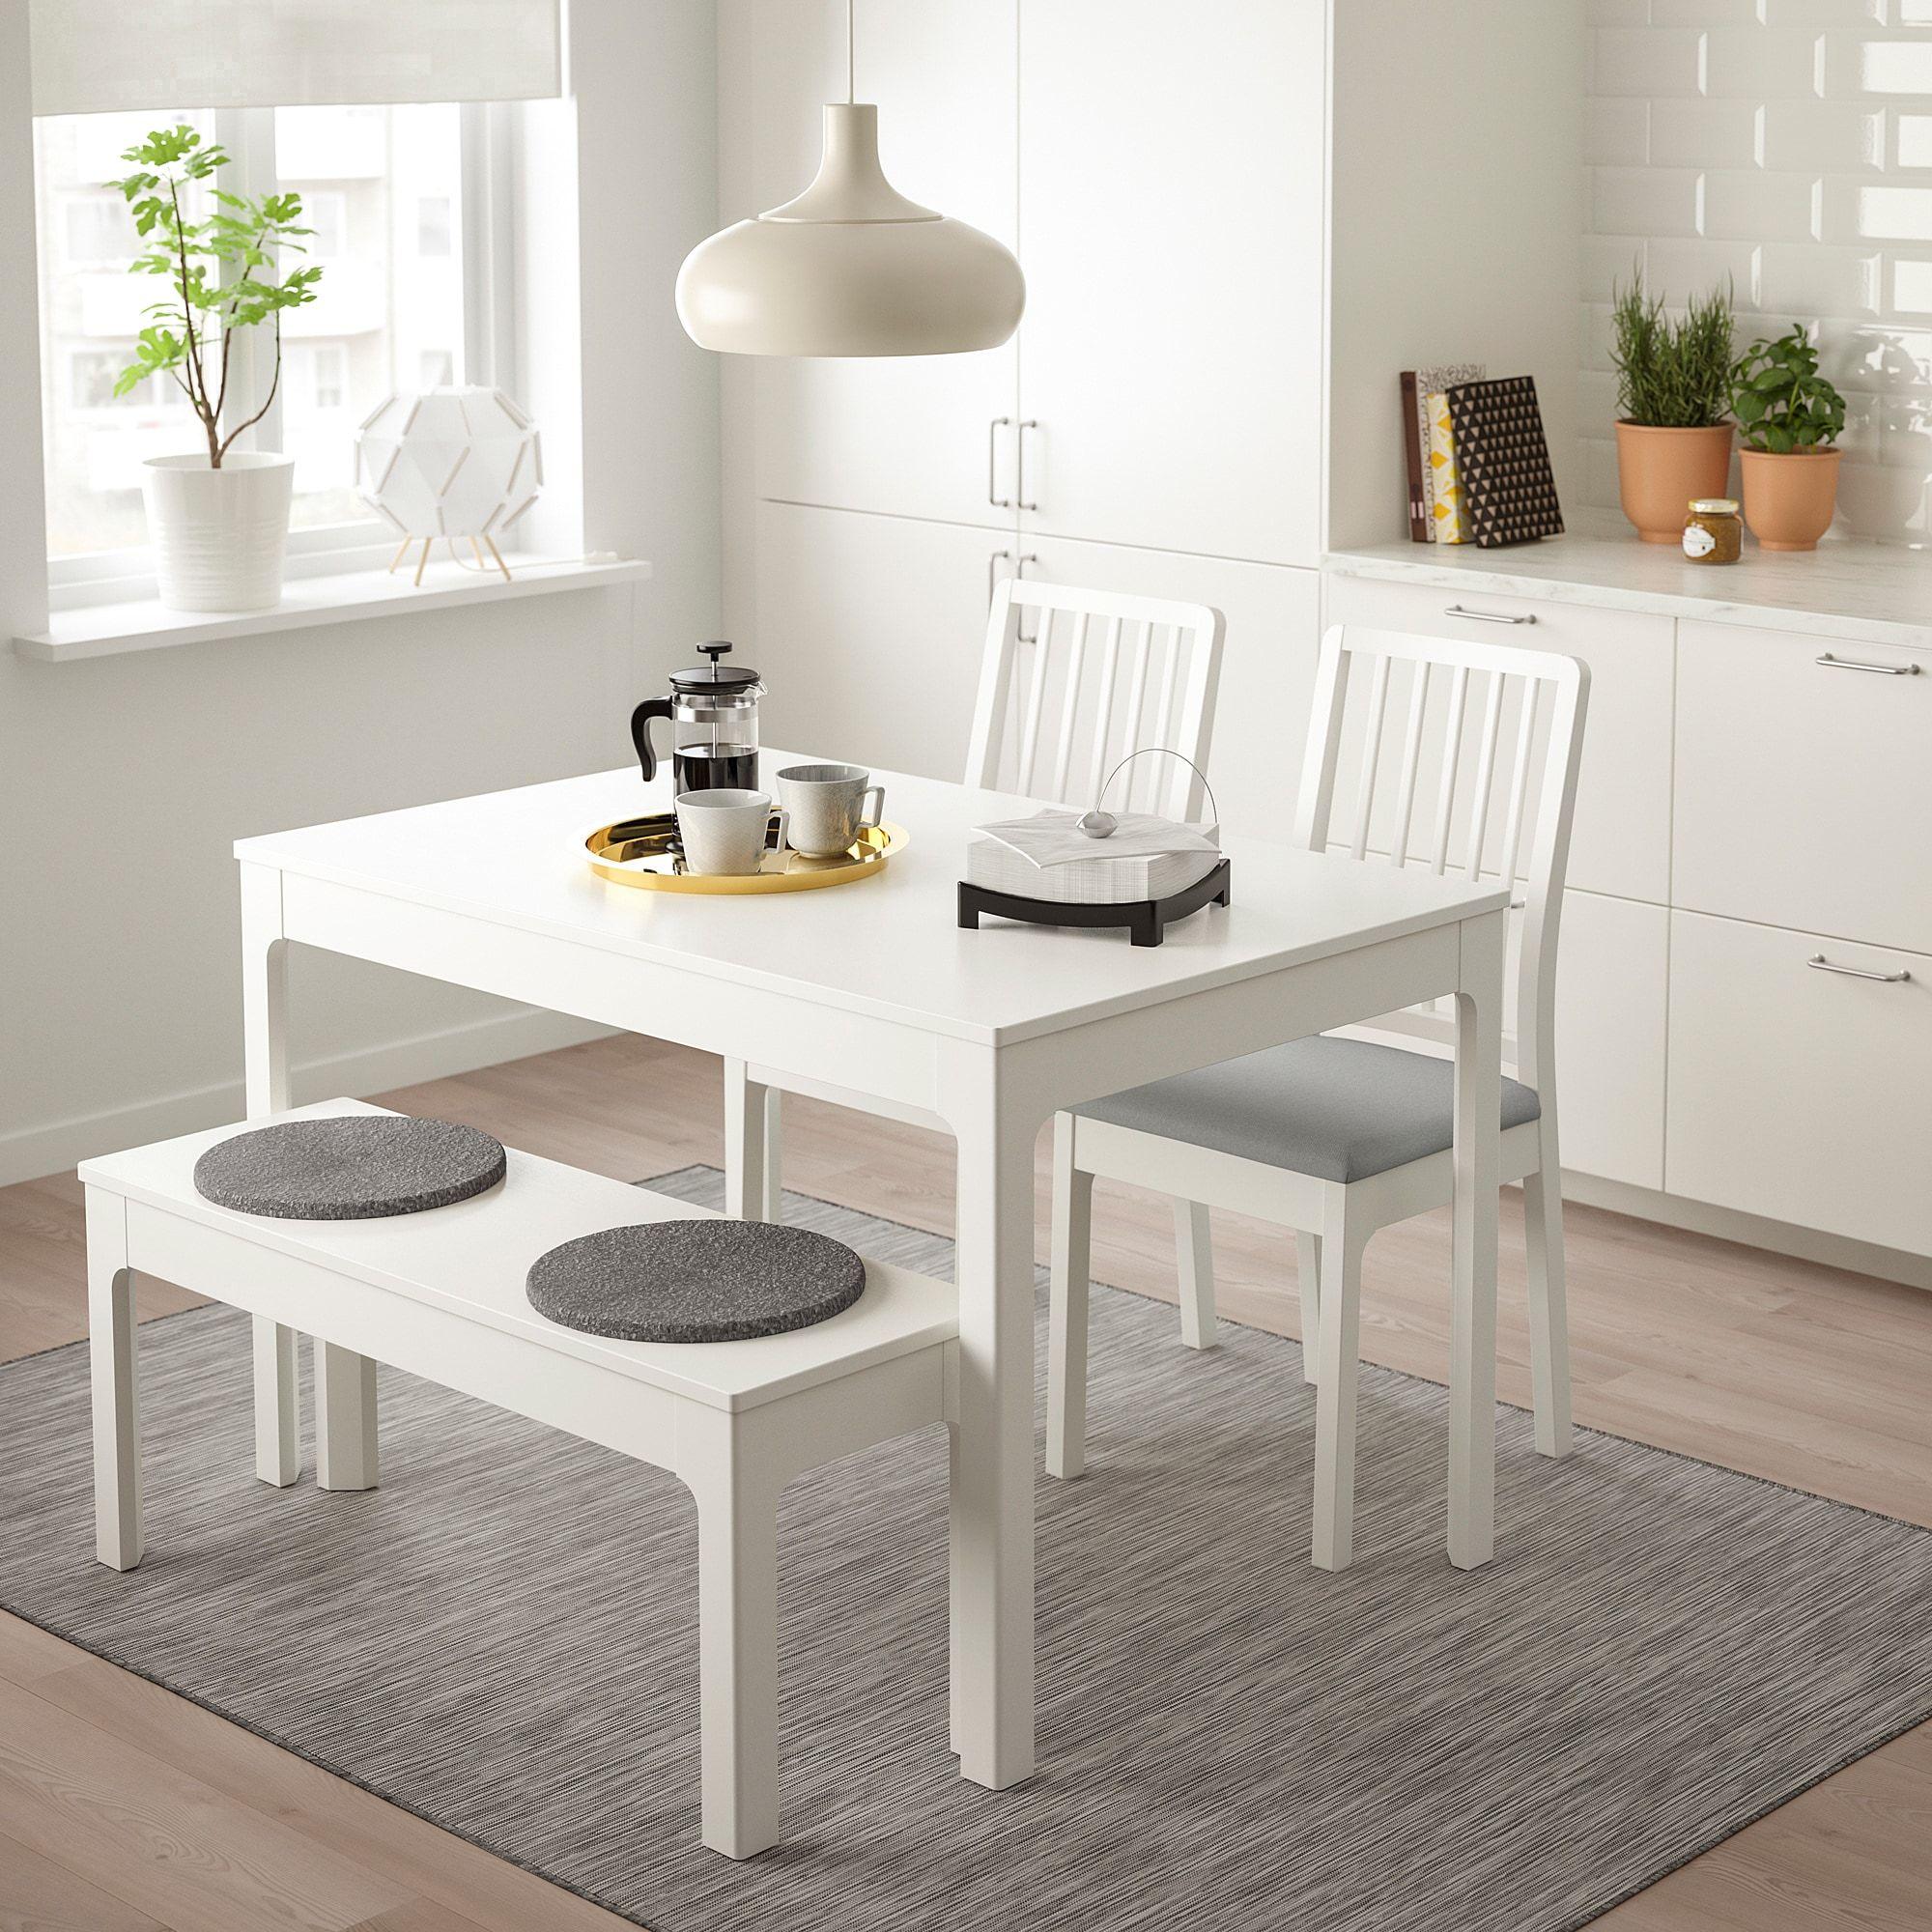 Ekedalen Ekedalen Table 2 Chaises Et Banc Blanc Orrsta